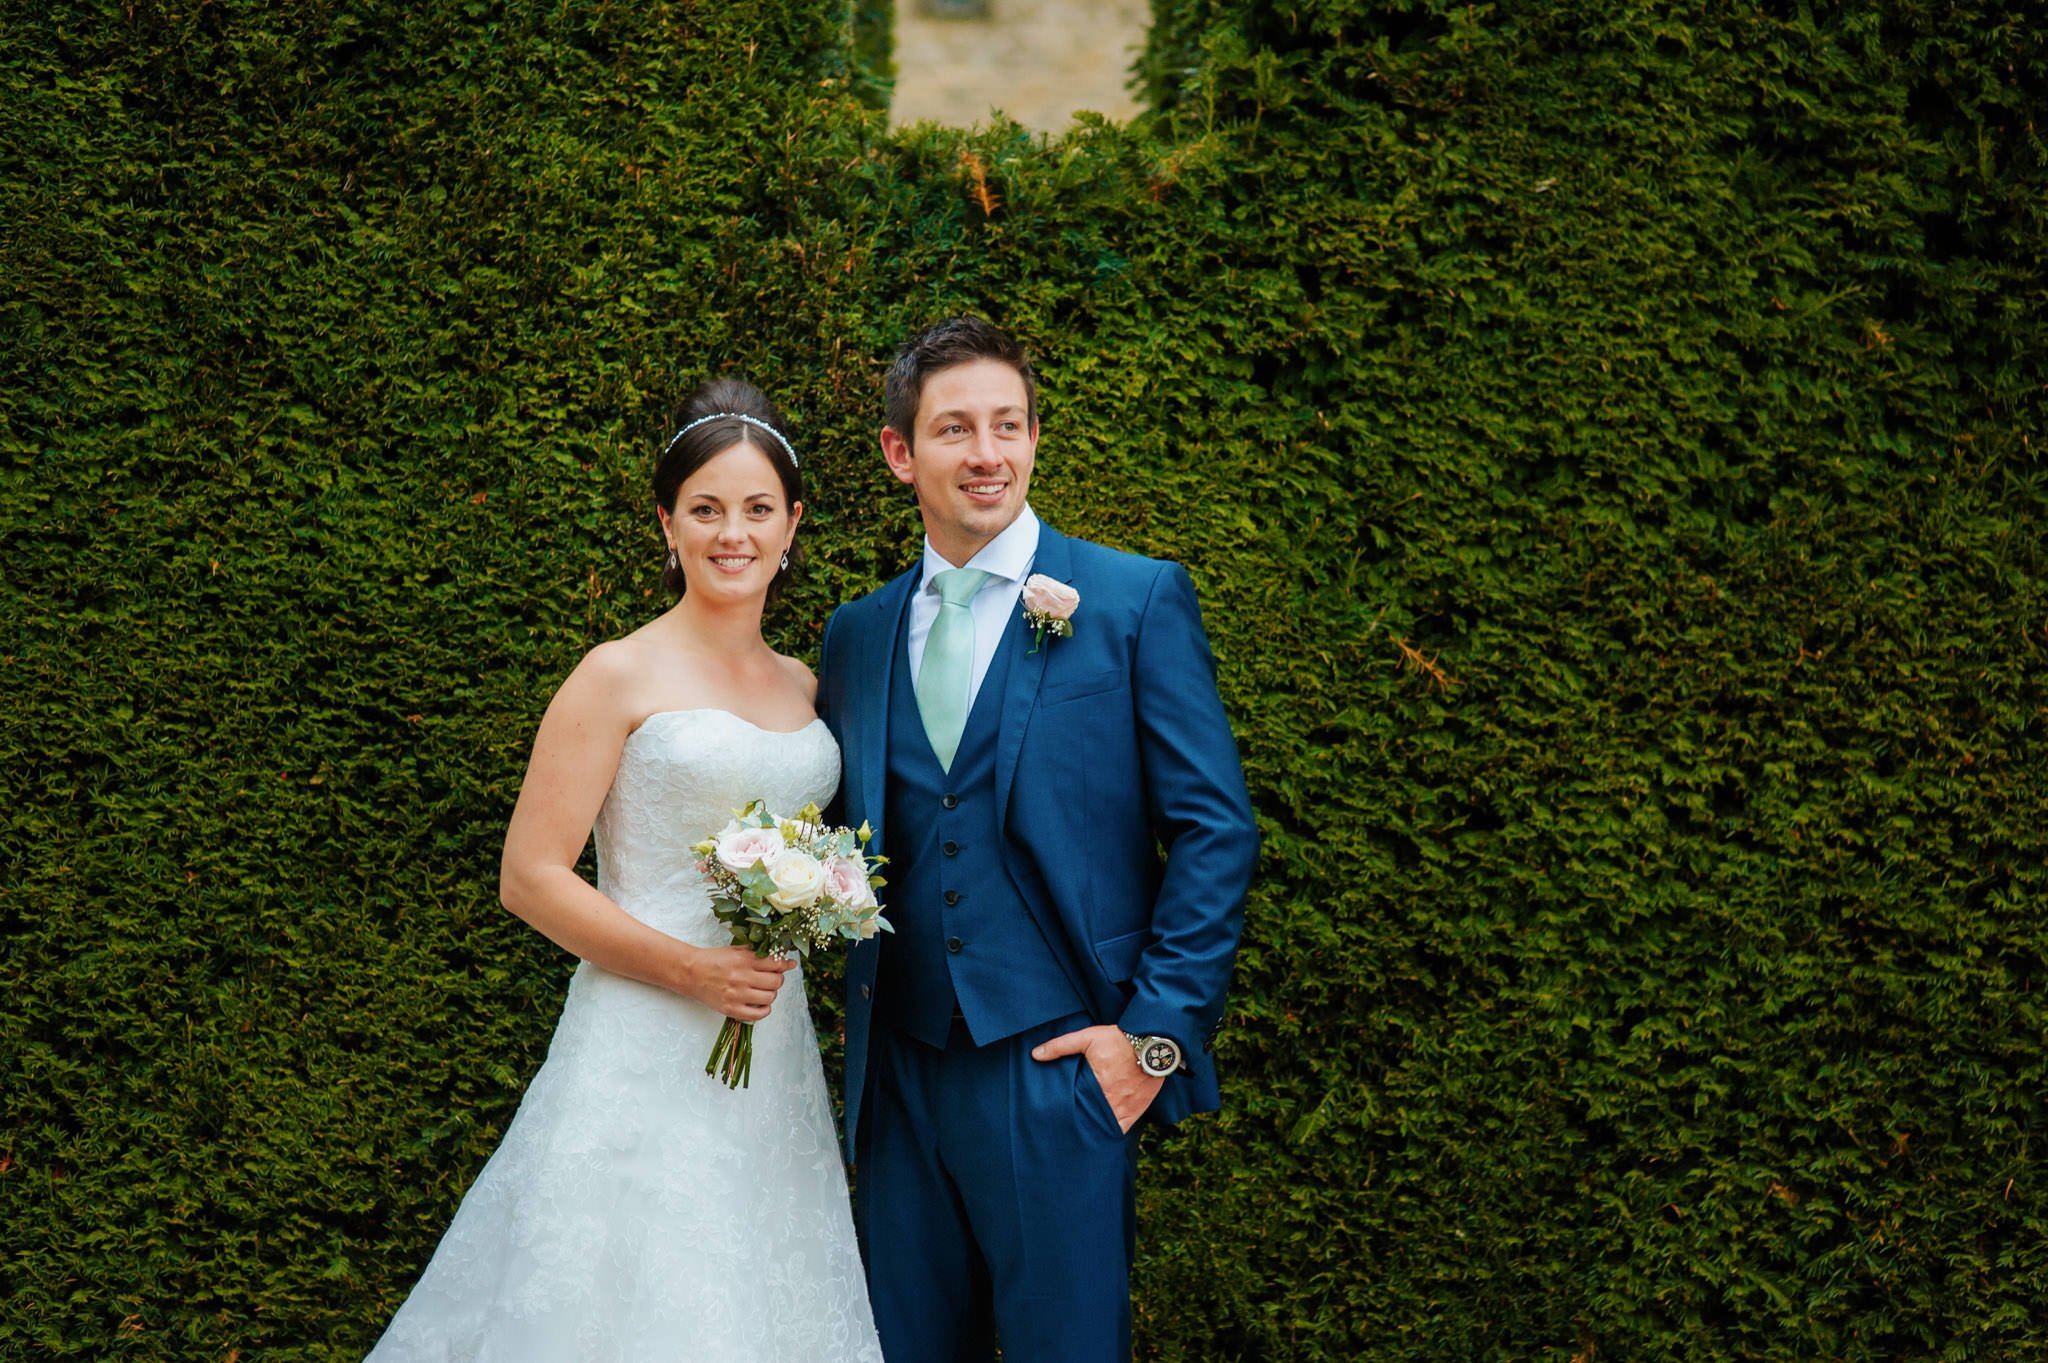 Eastnor Castle wedding photographer Herefordshire, West Midlands - Sarah + Dean 59